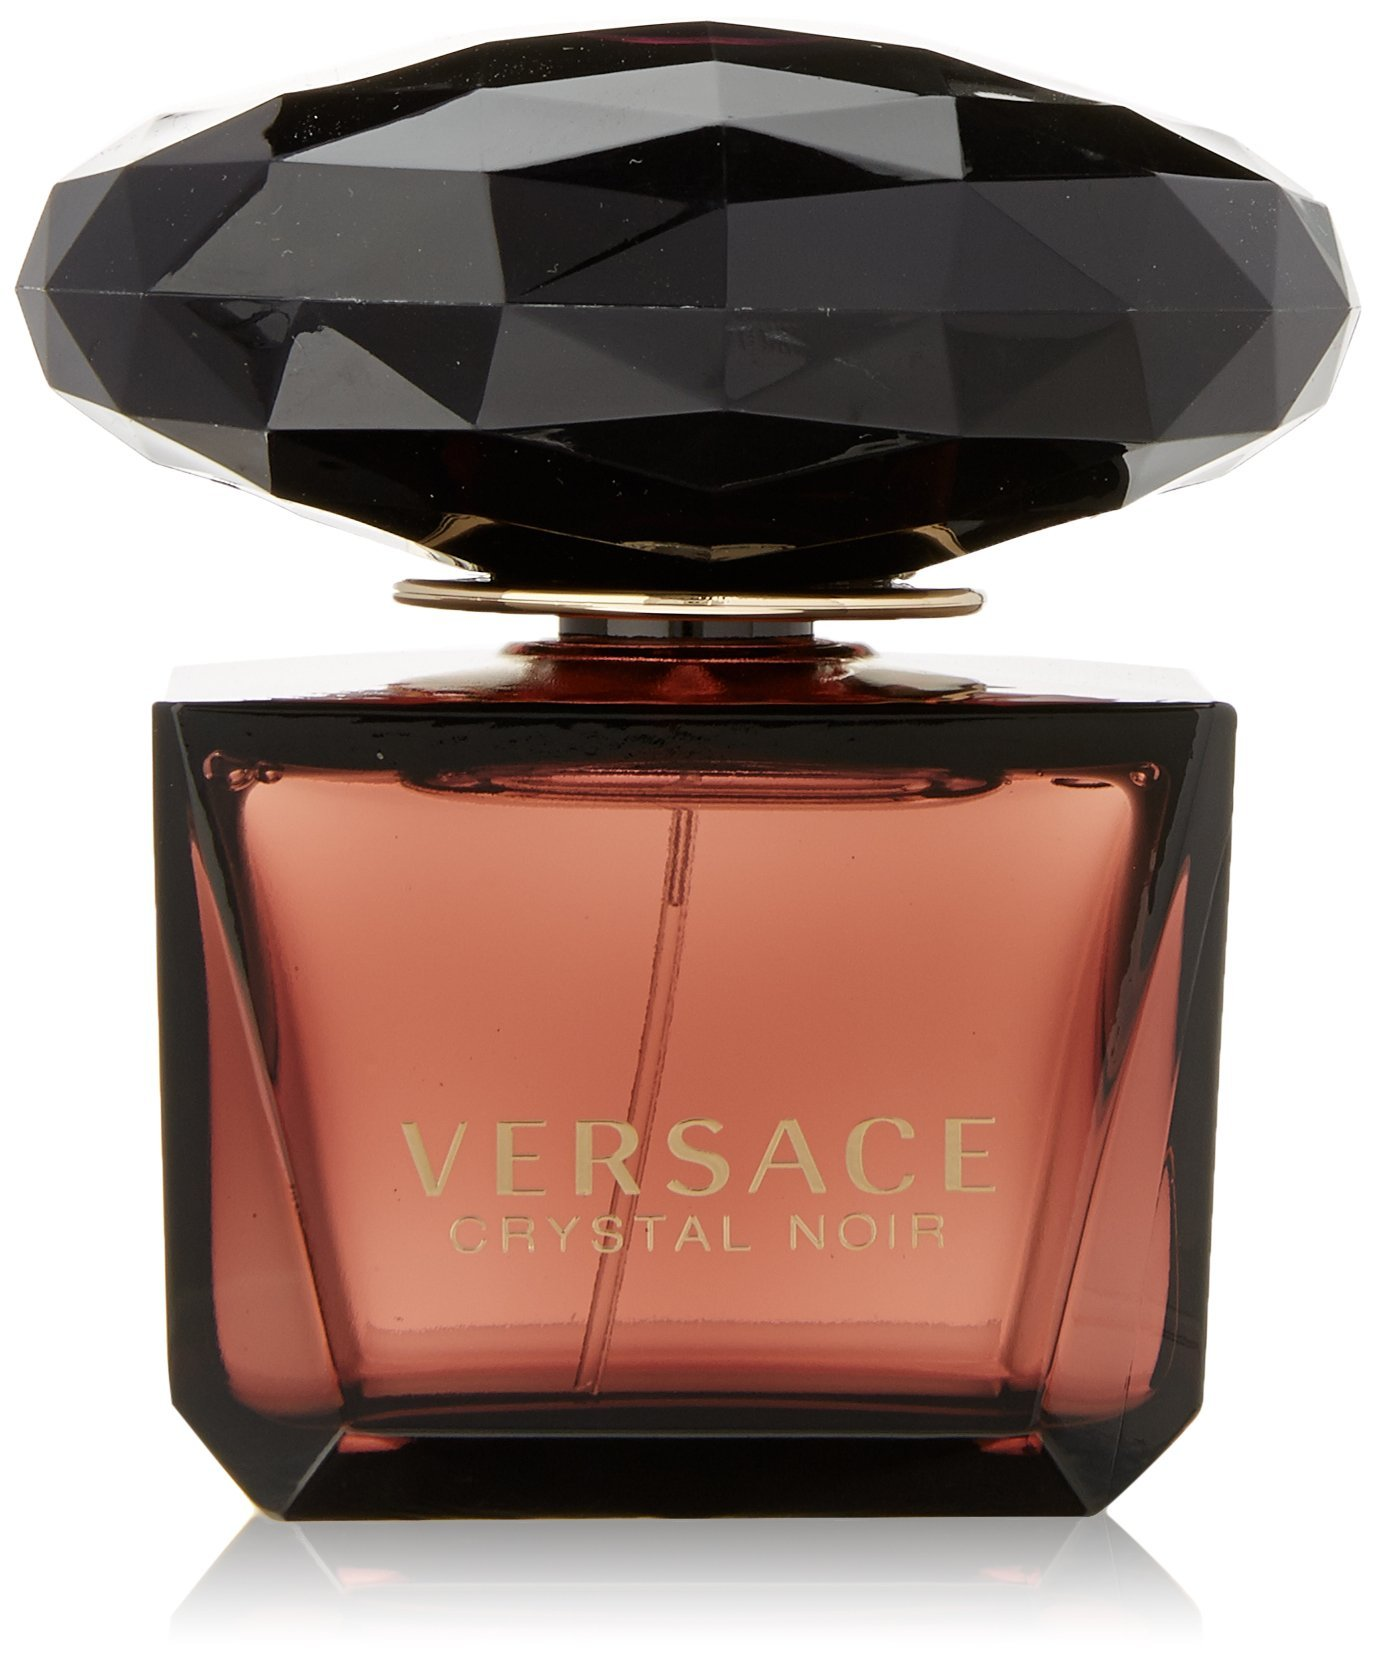 Versace Crystal Noir By Gianni Versace For Women Eau De Parfum Spray, 3-Ounces